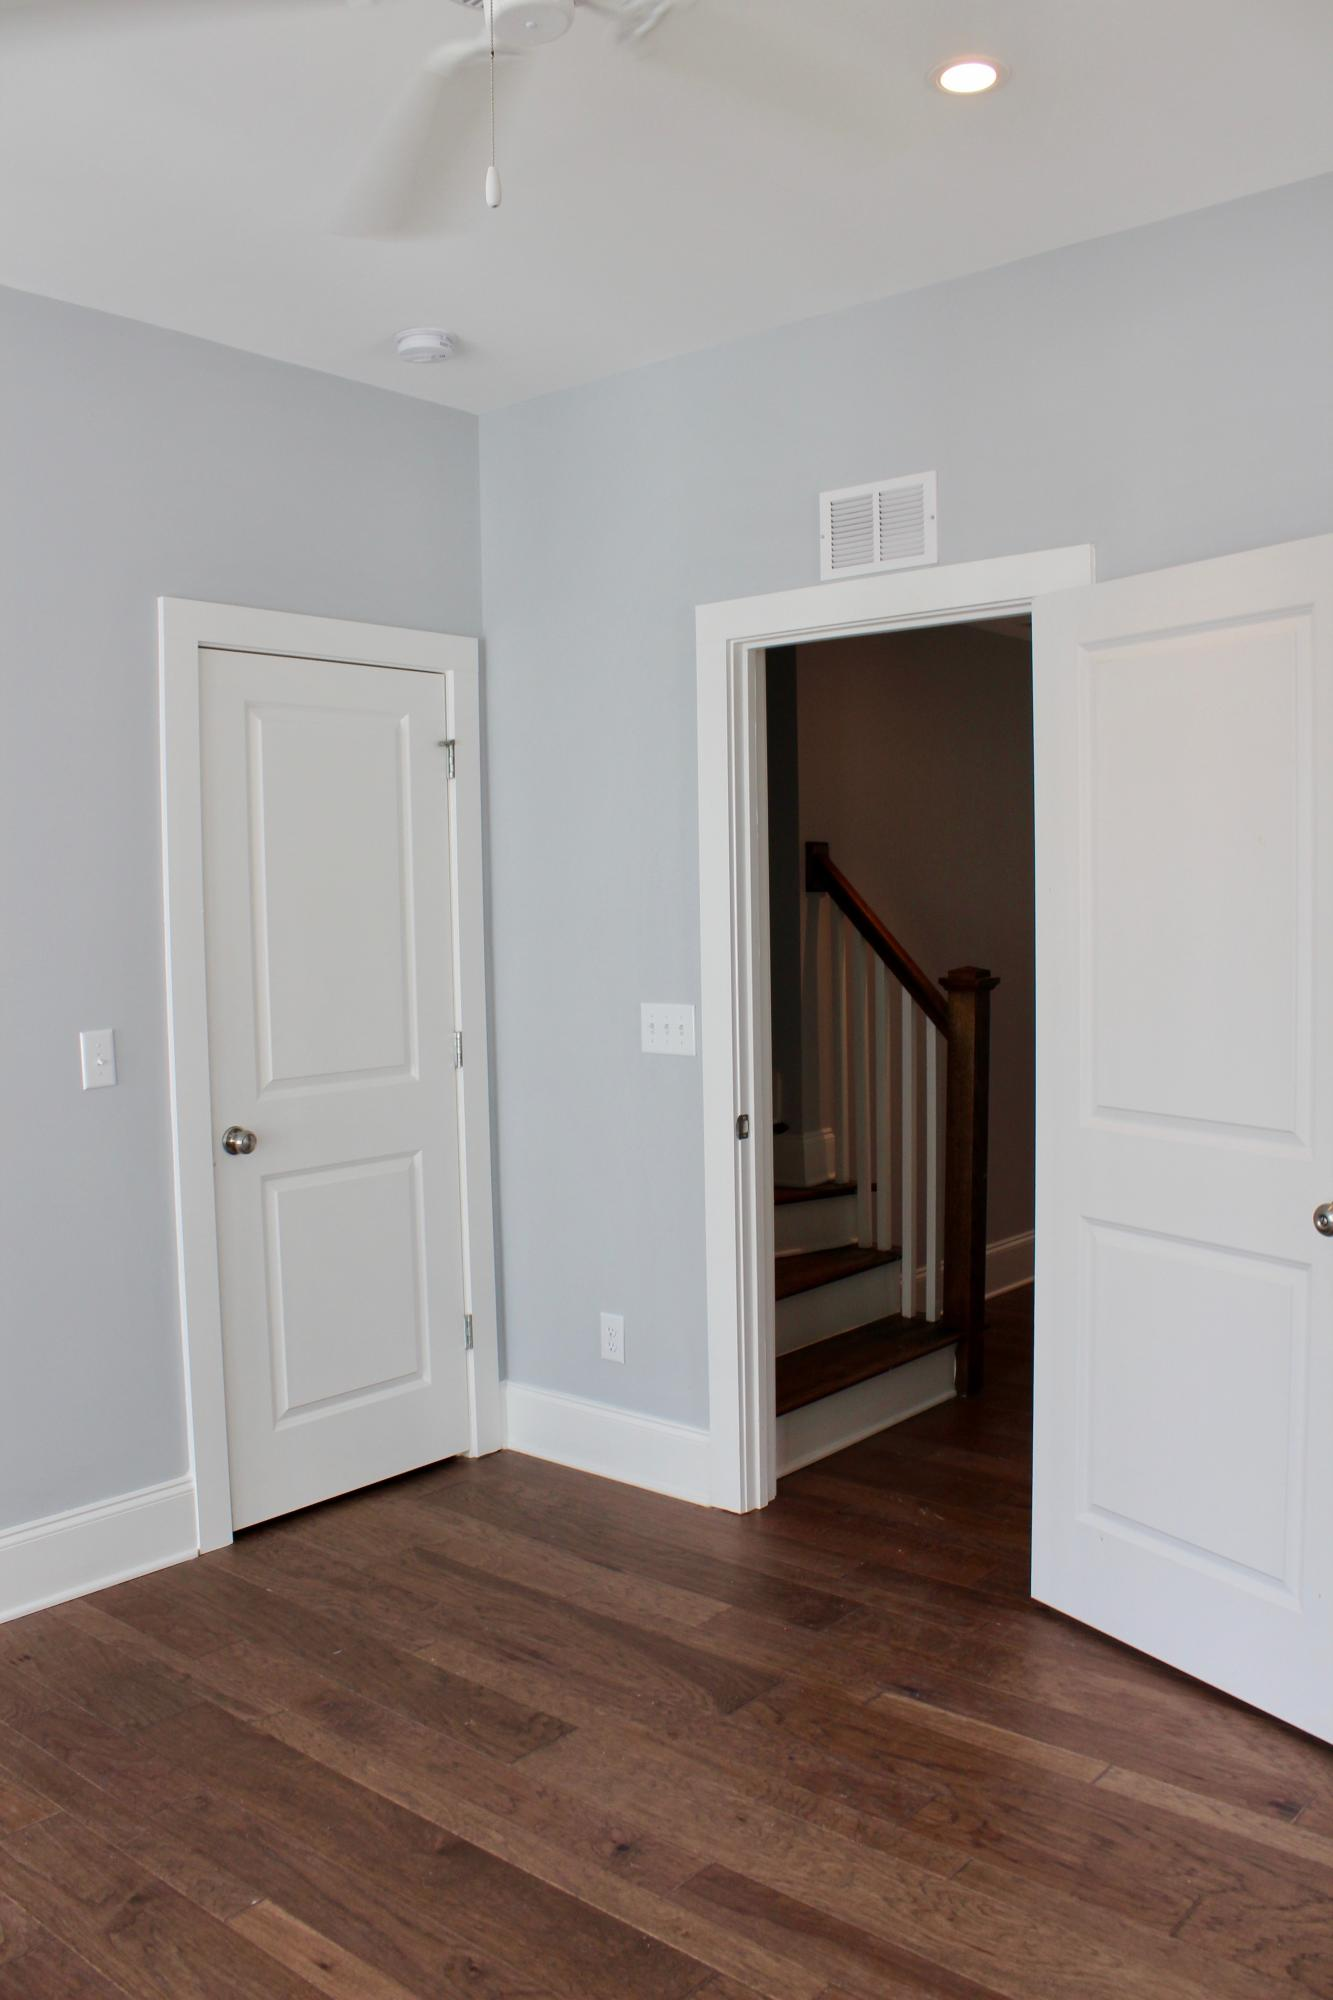 Morris Square Homes For Sale - 46 Dereef, Charleston, SC - 18